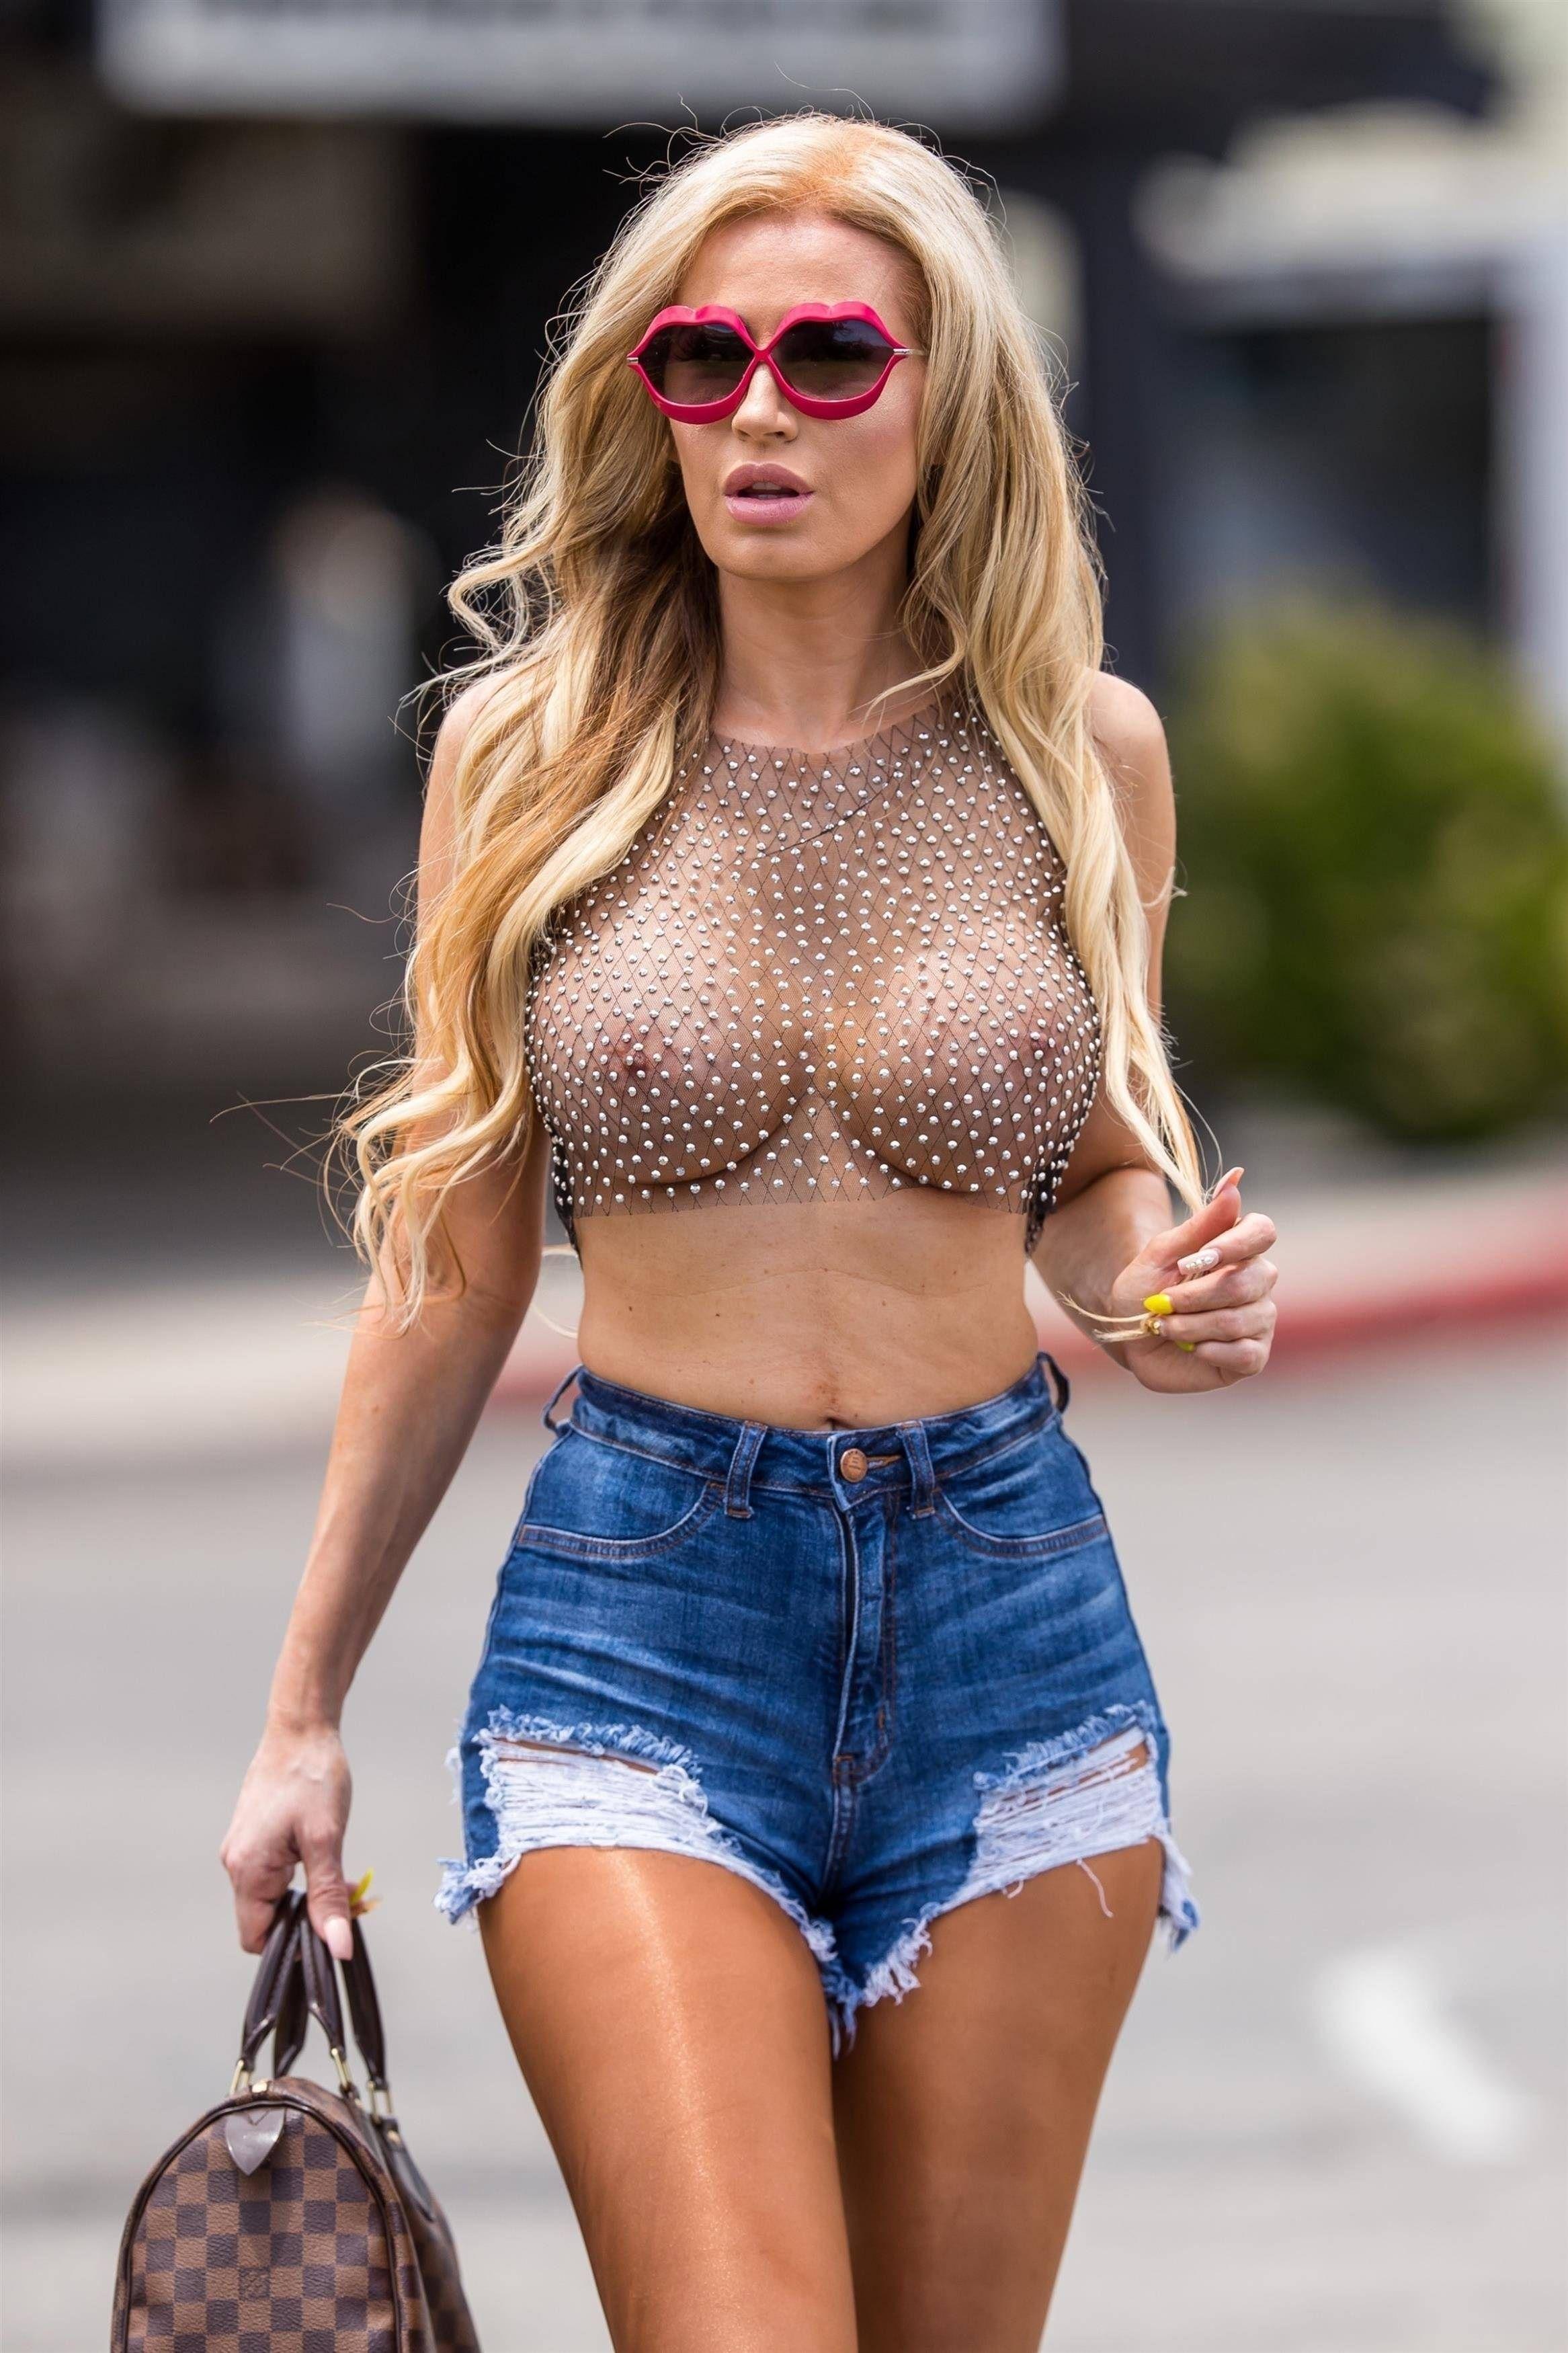 Best big tits porno ever